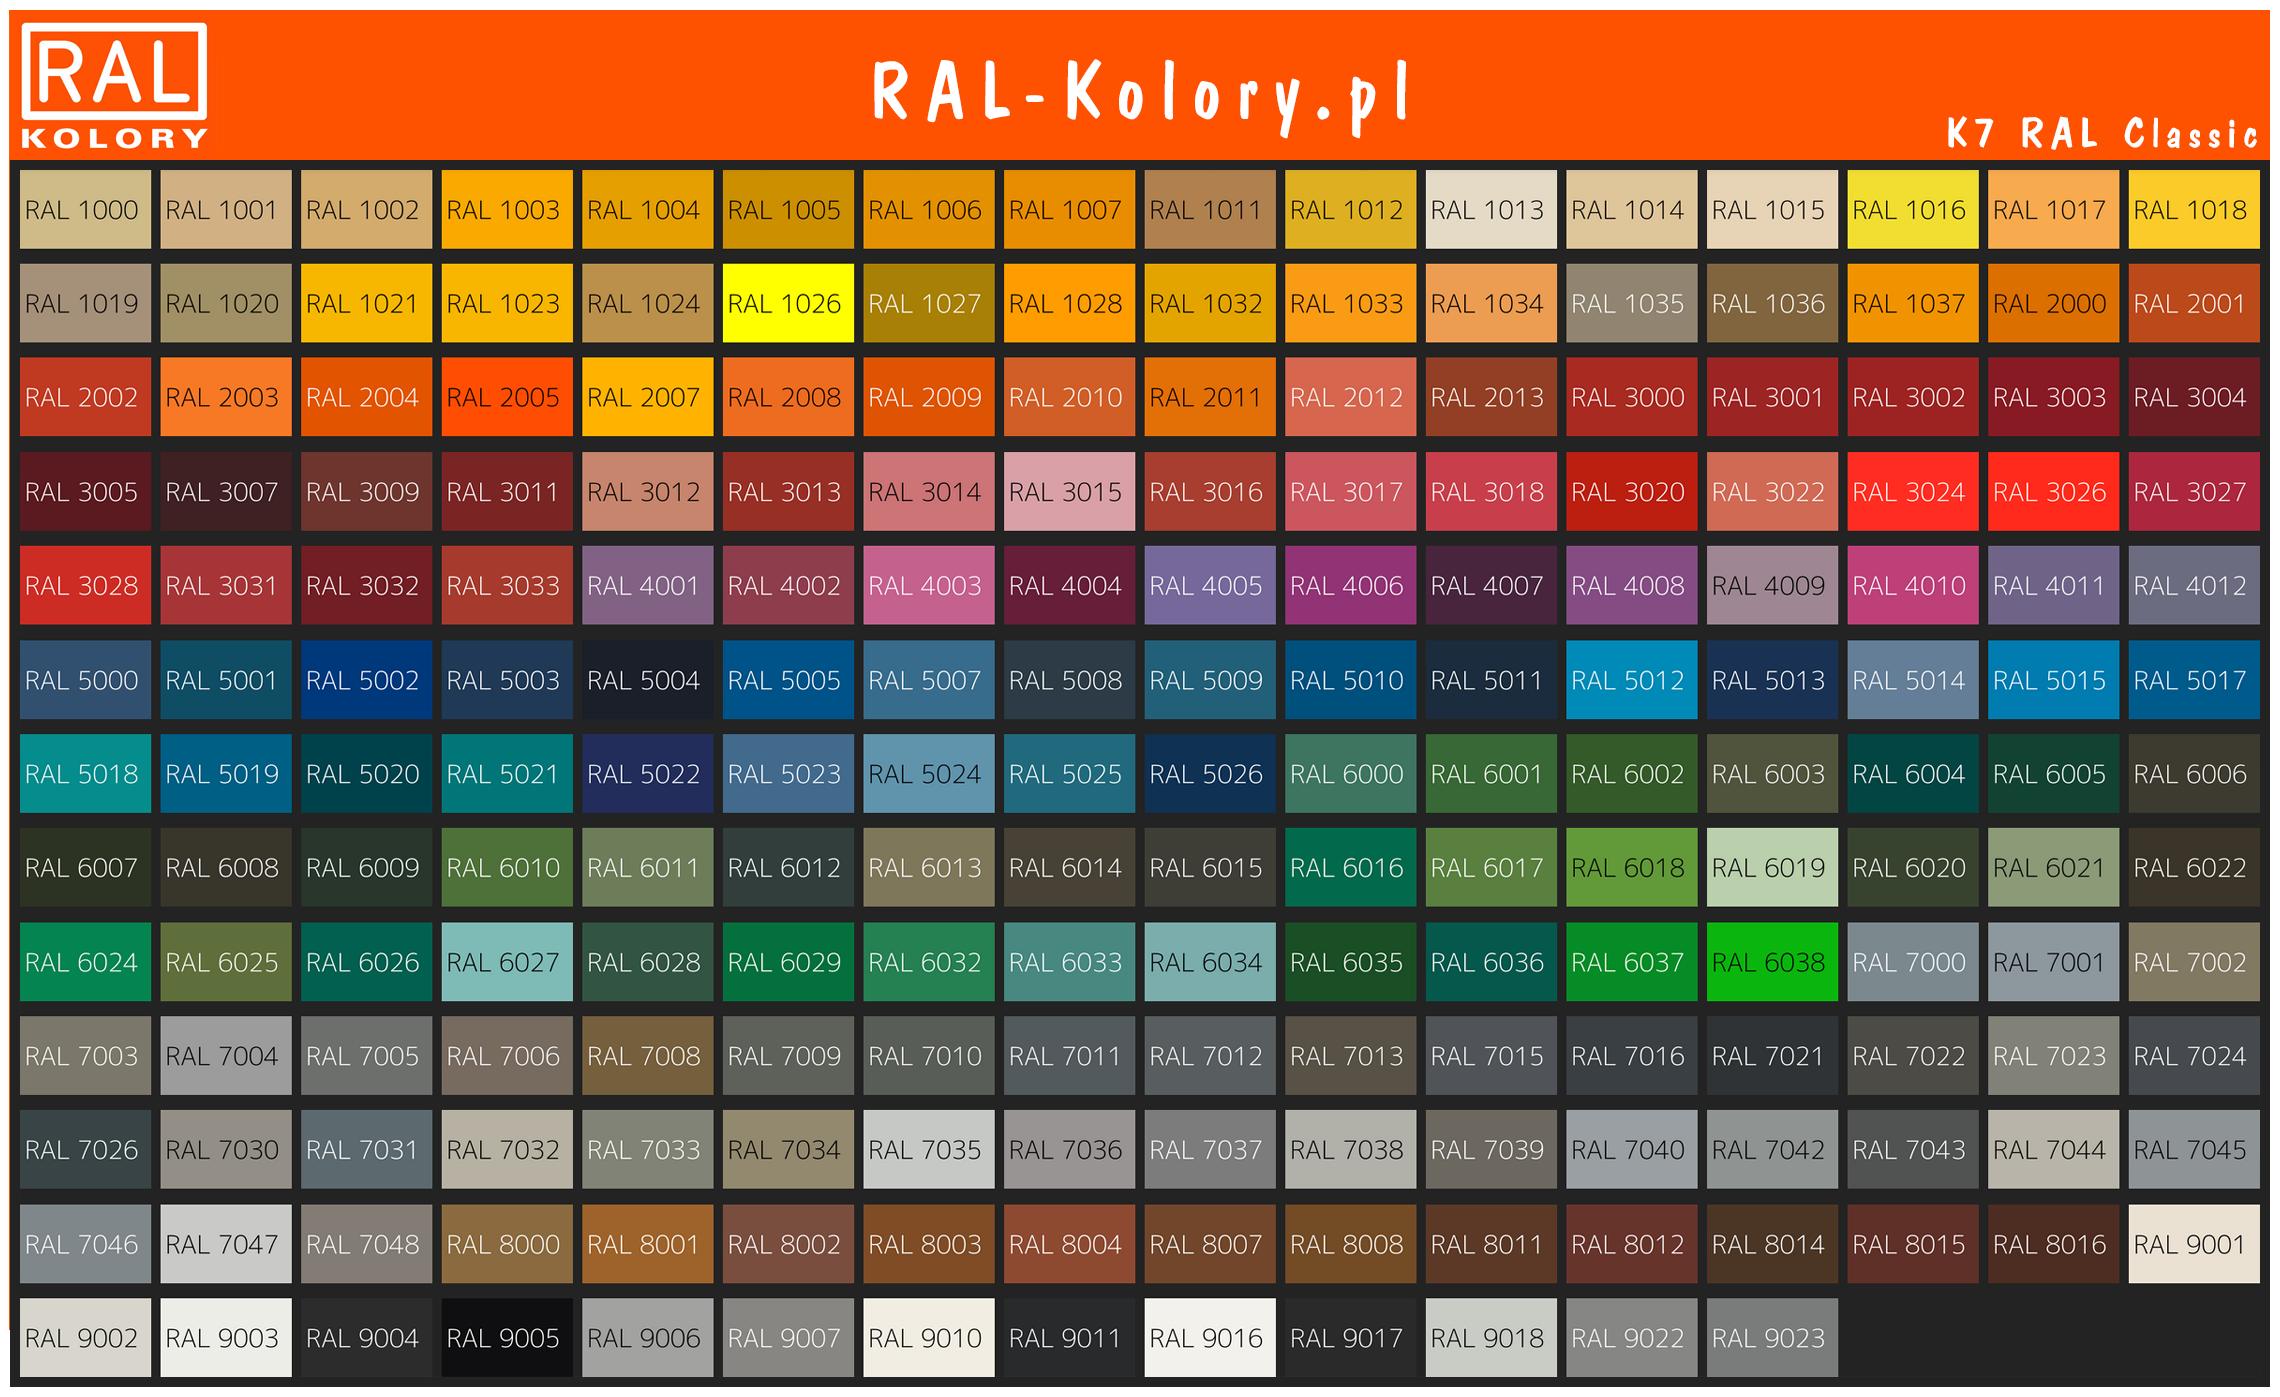 K7 RAL Wzornik kolorów PL